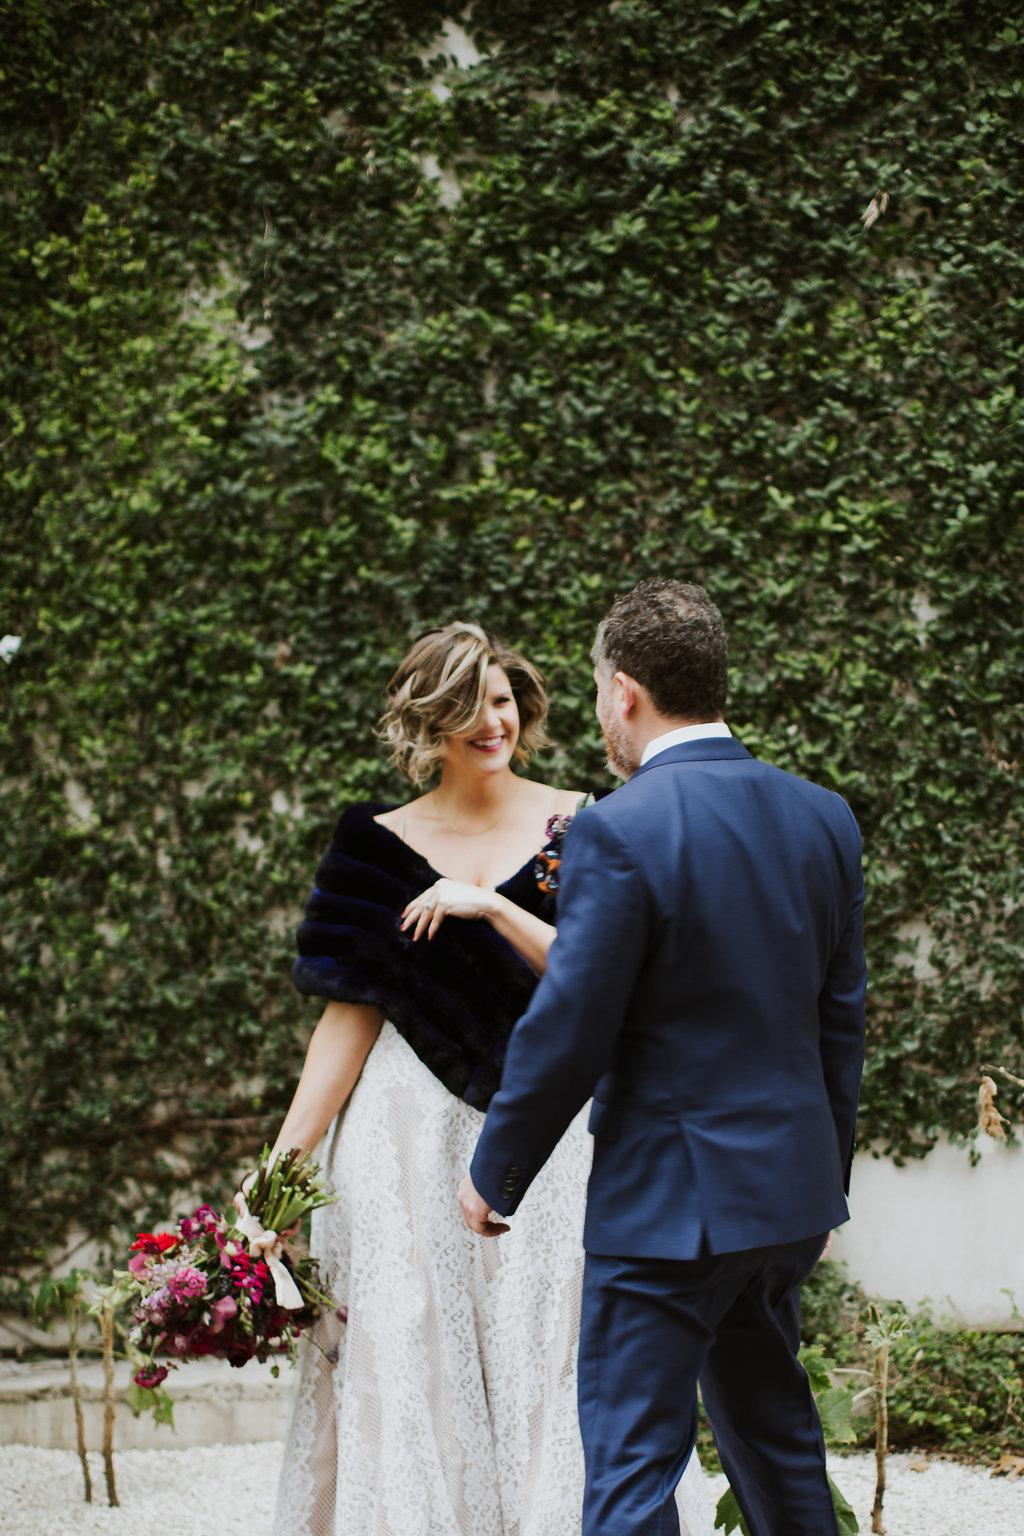 Paige-Newton-Intimate-Wedding-Photographer-Malverde-Wedding-Photography0028.jpg